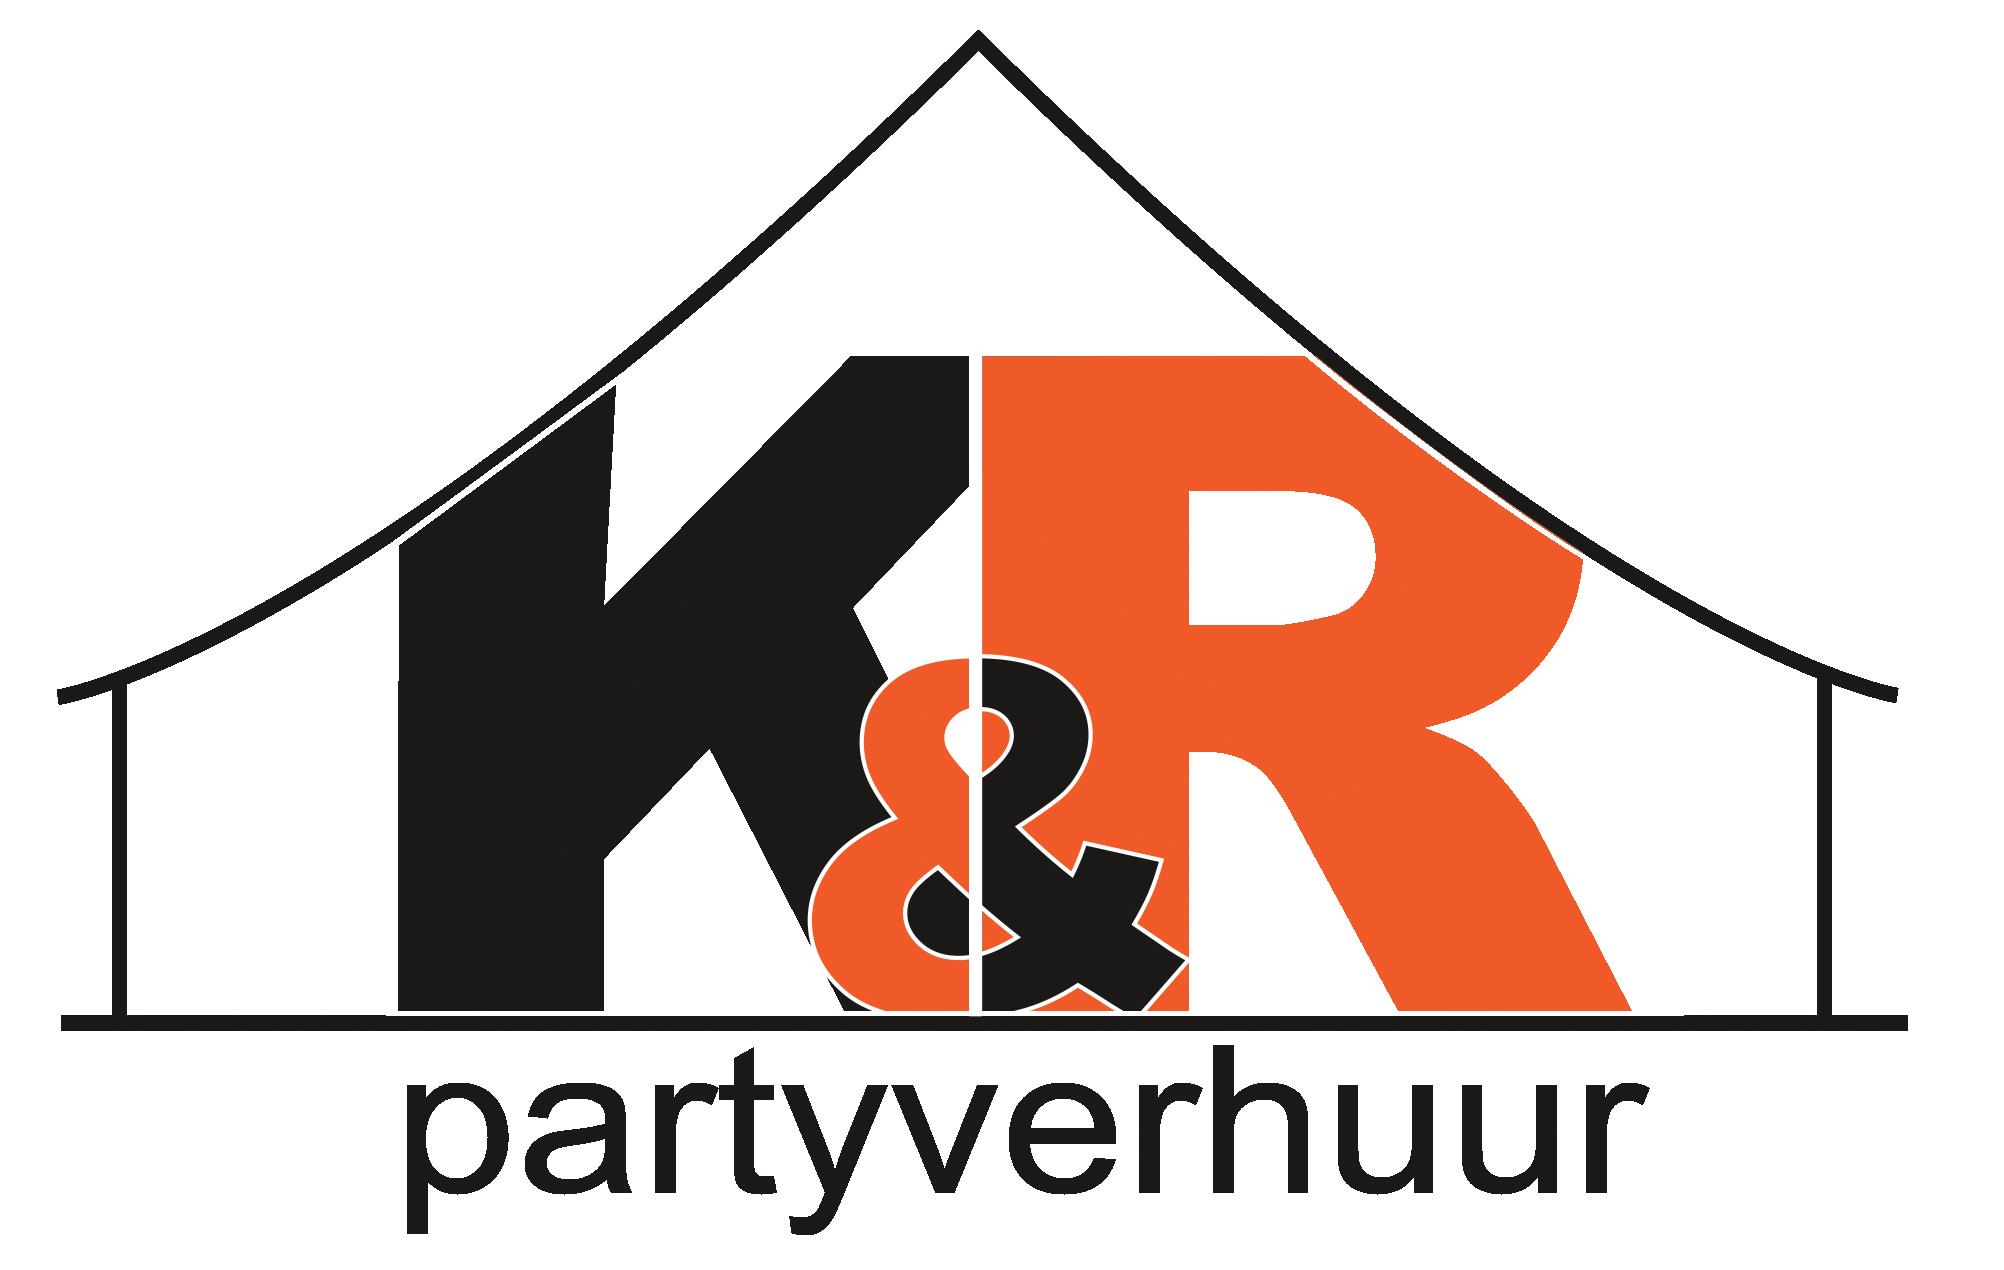 K&R Partyverhuur